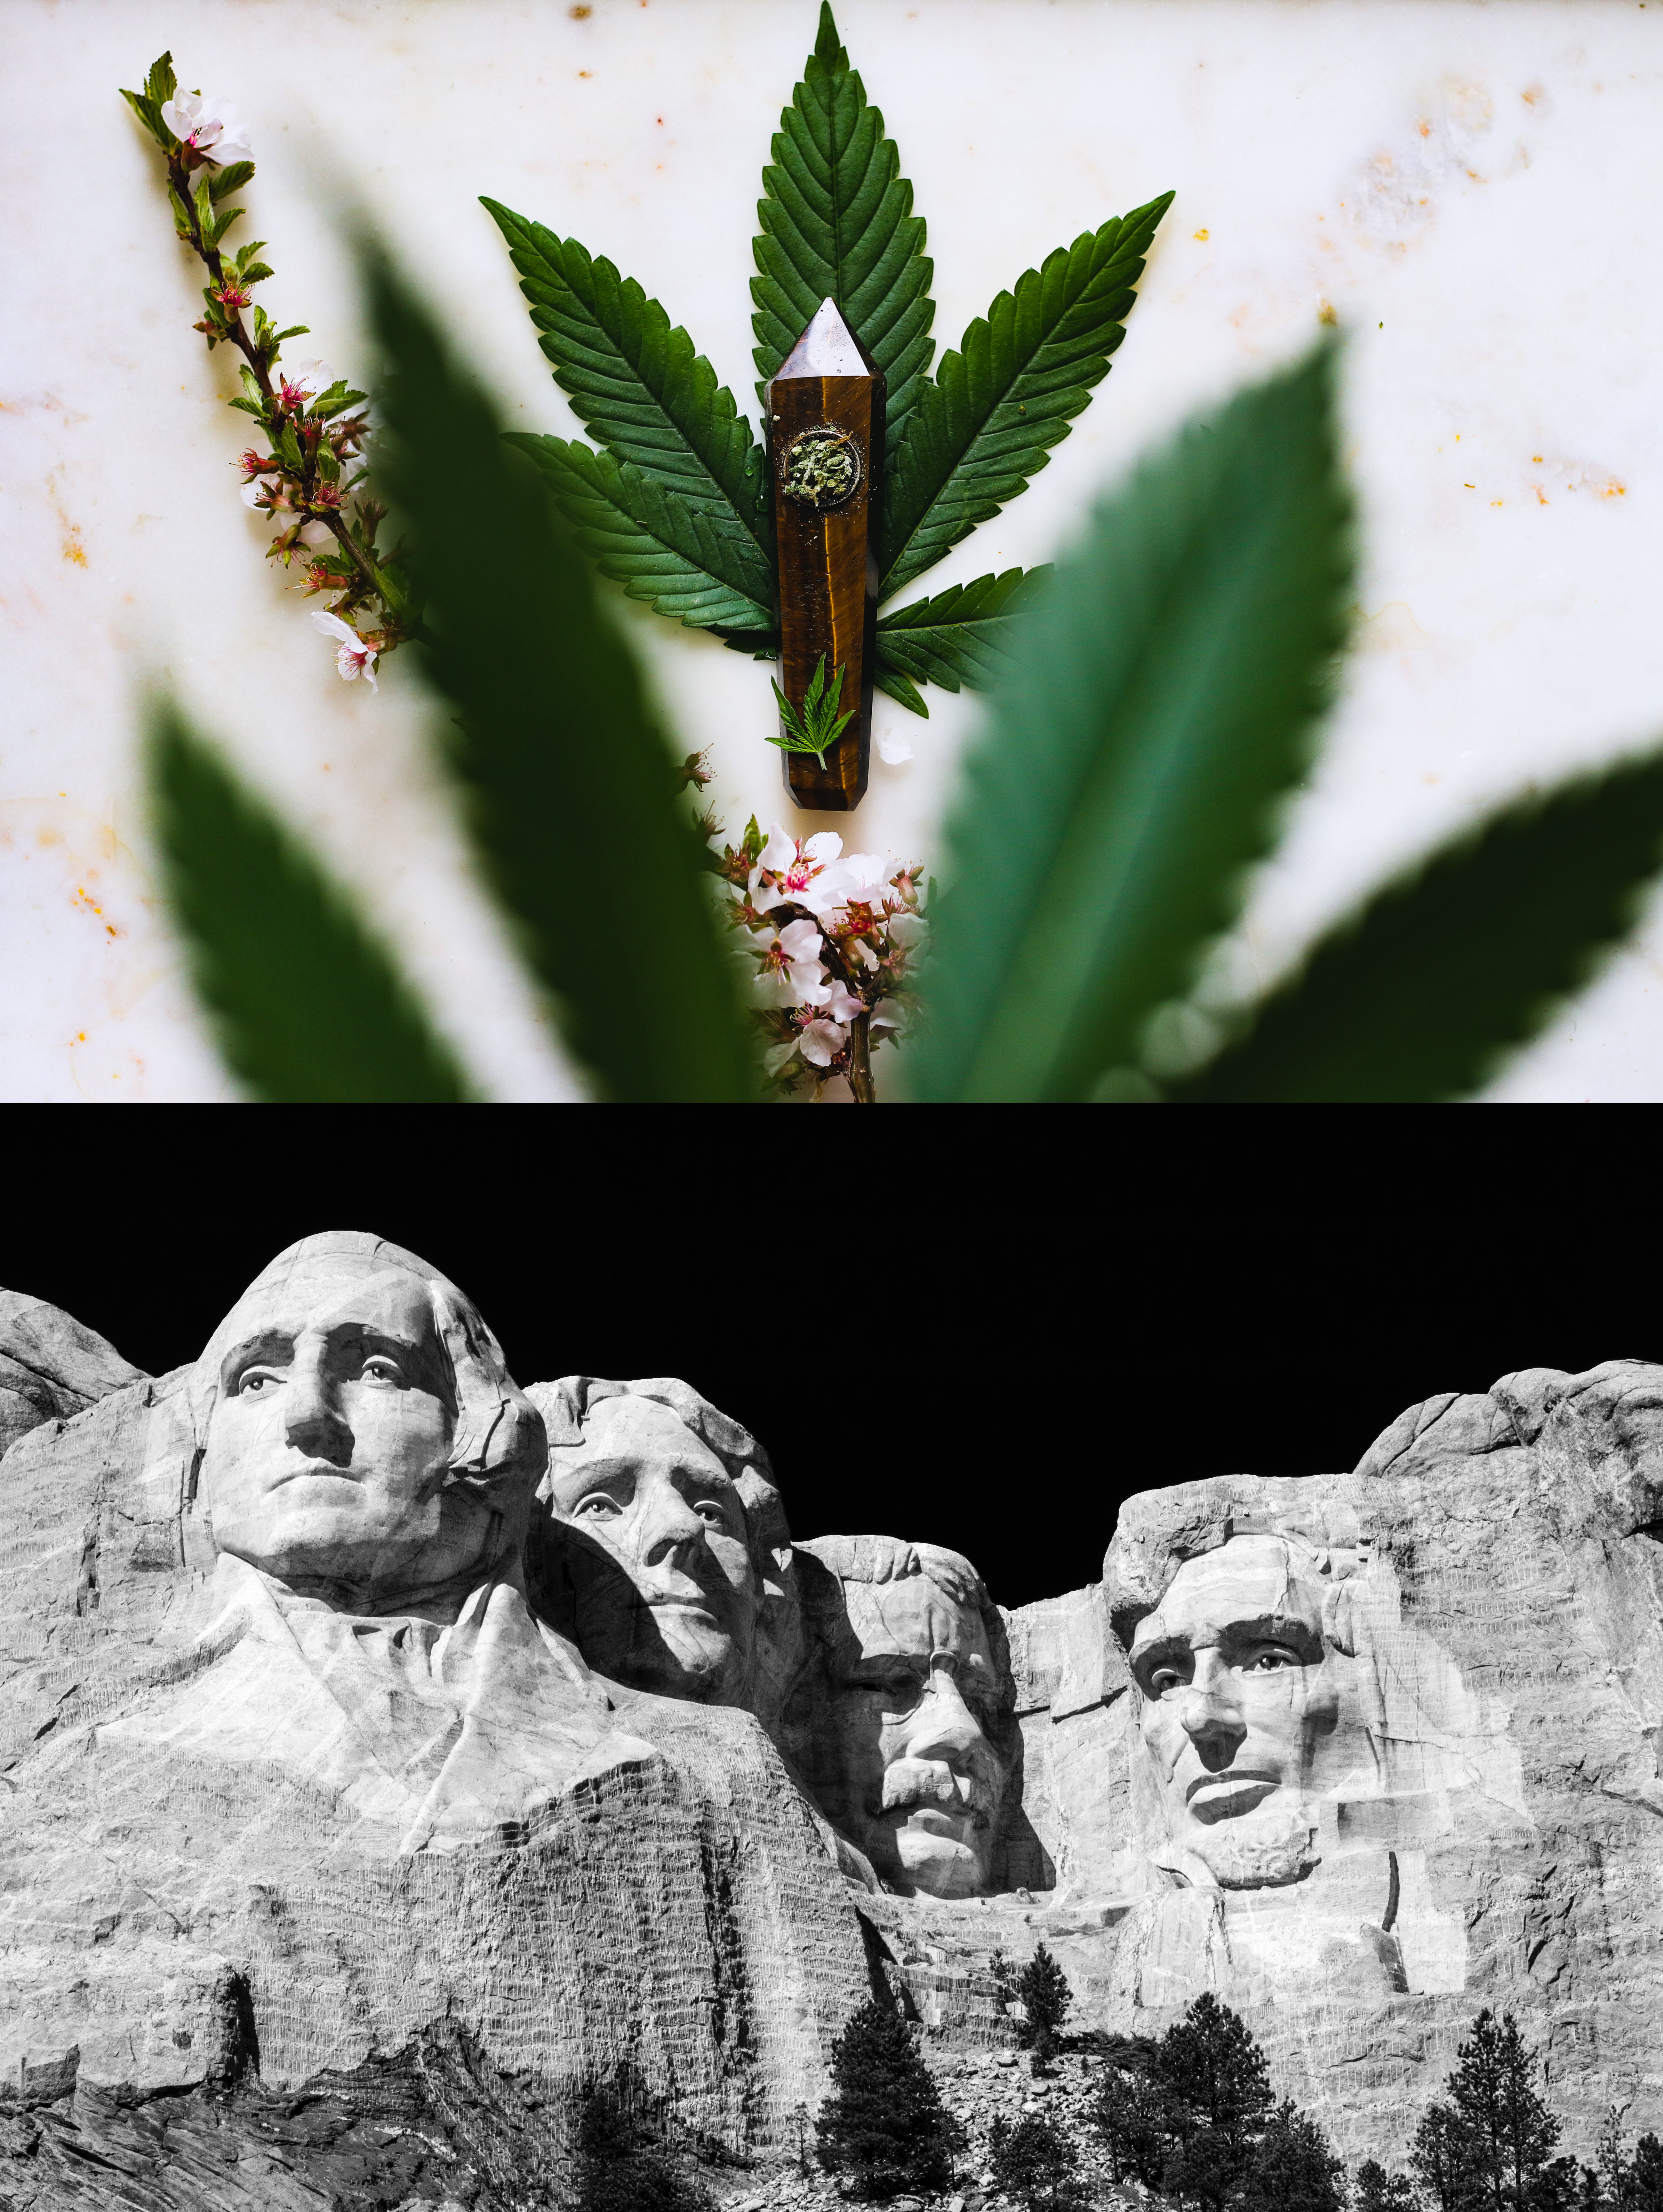 (Top) Marijuana leaf and pipe. (Bottom) Mt. Rushmore, South Dakota.